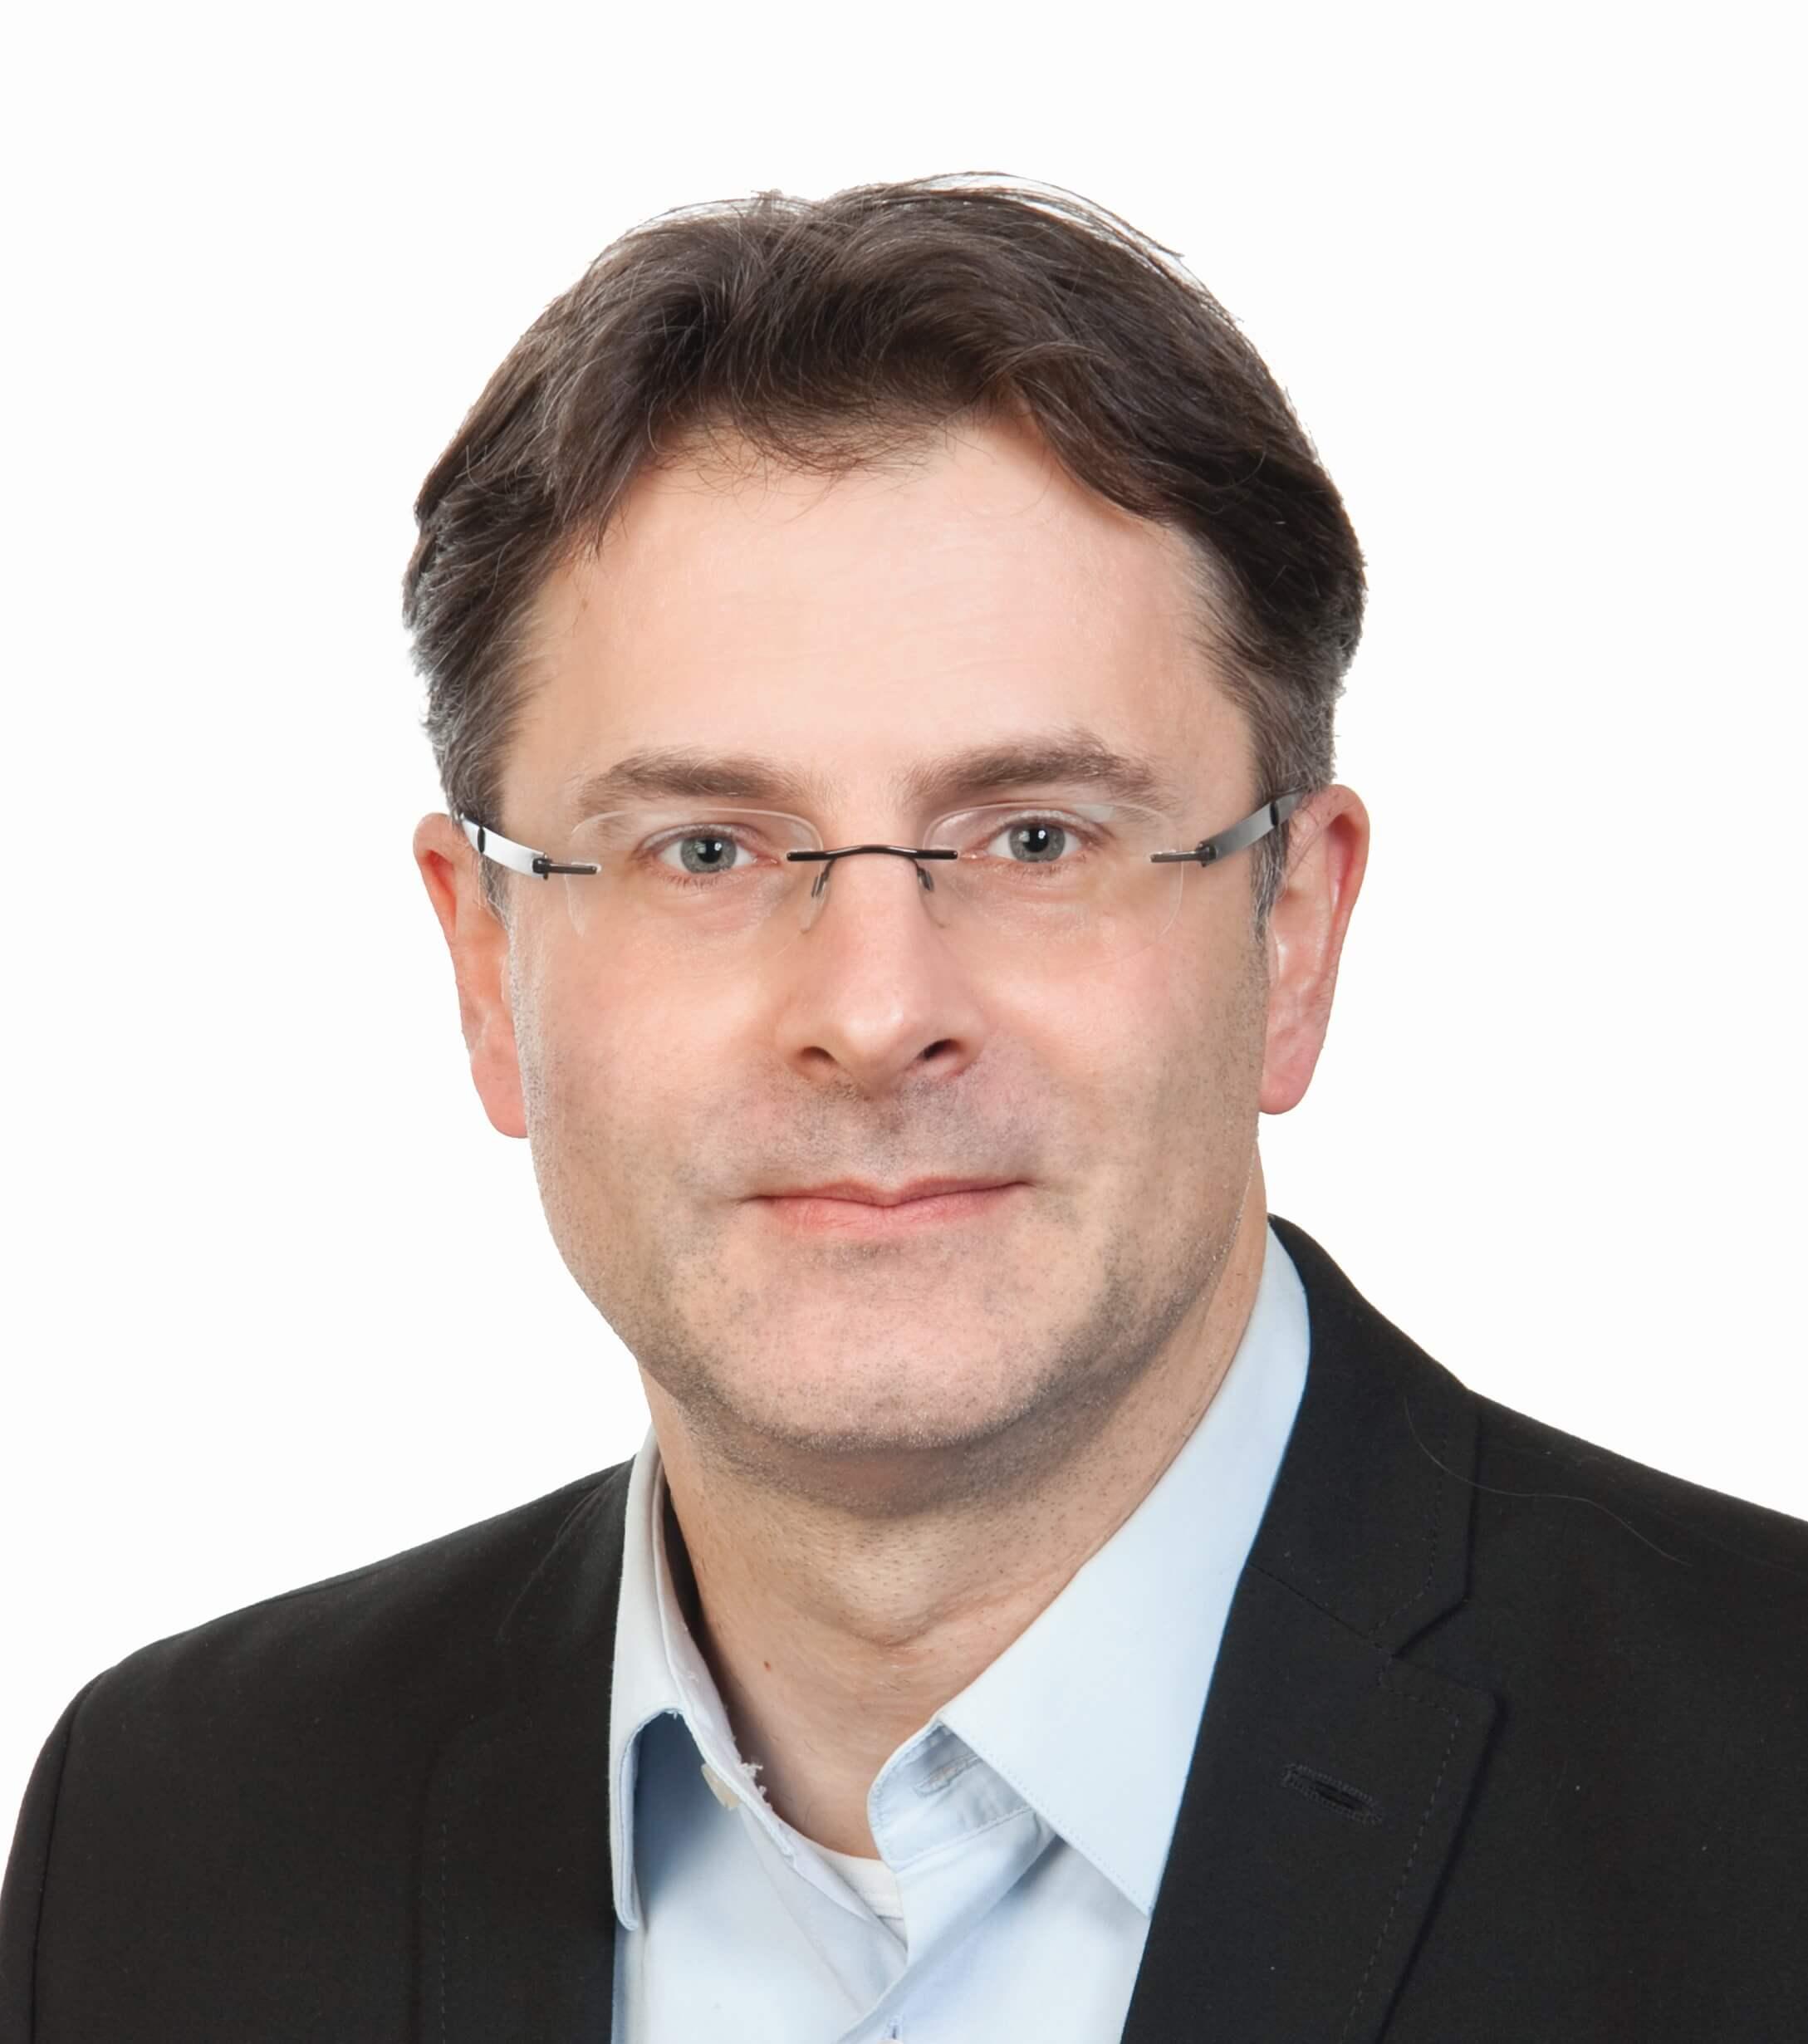 Frank Niehaus